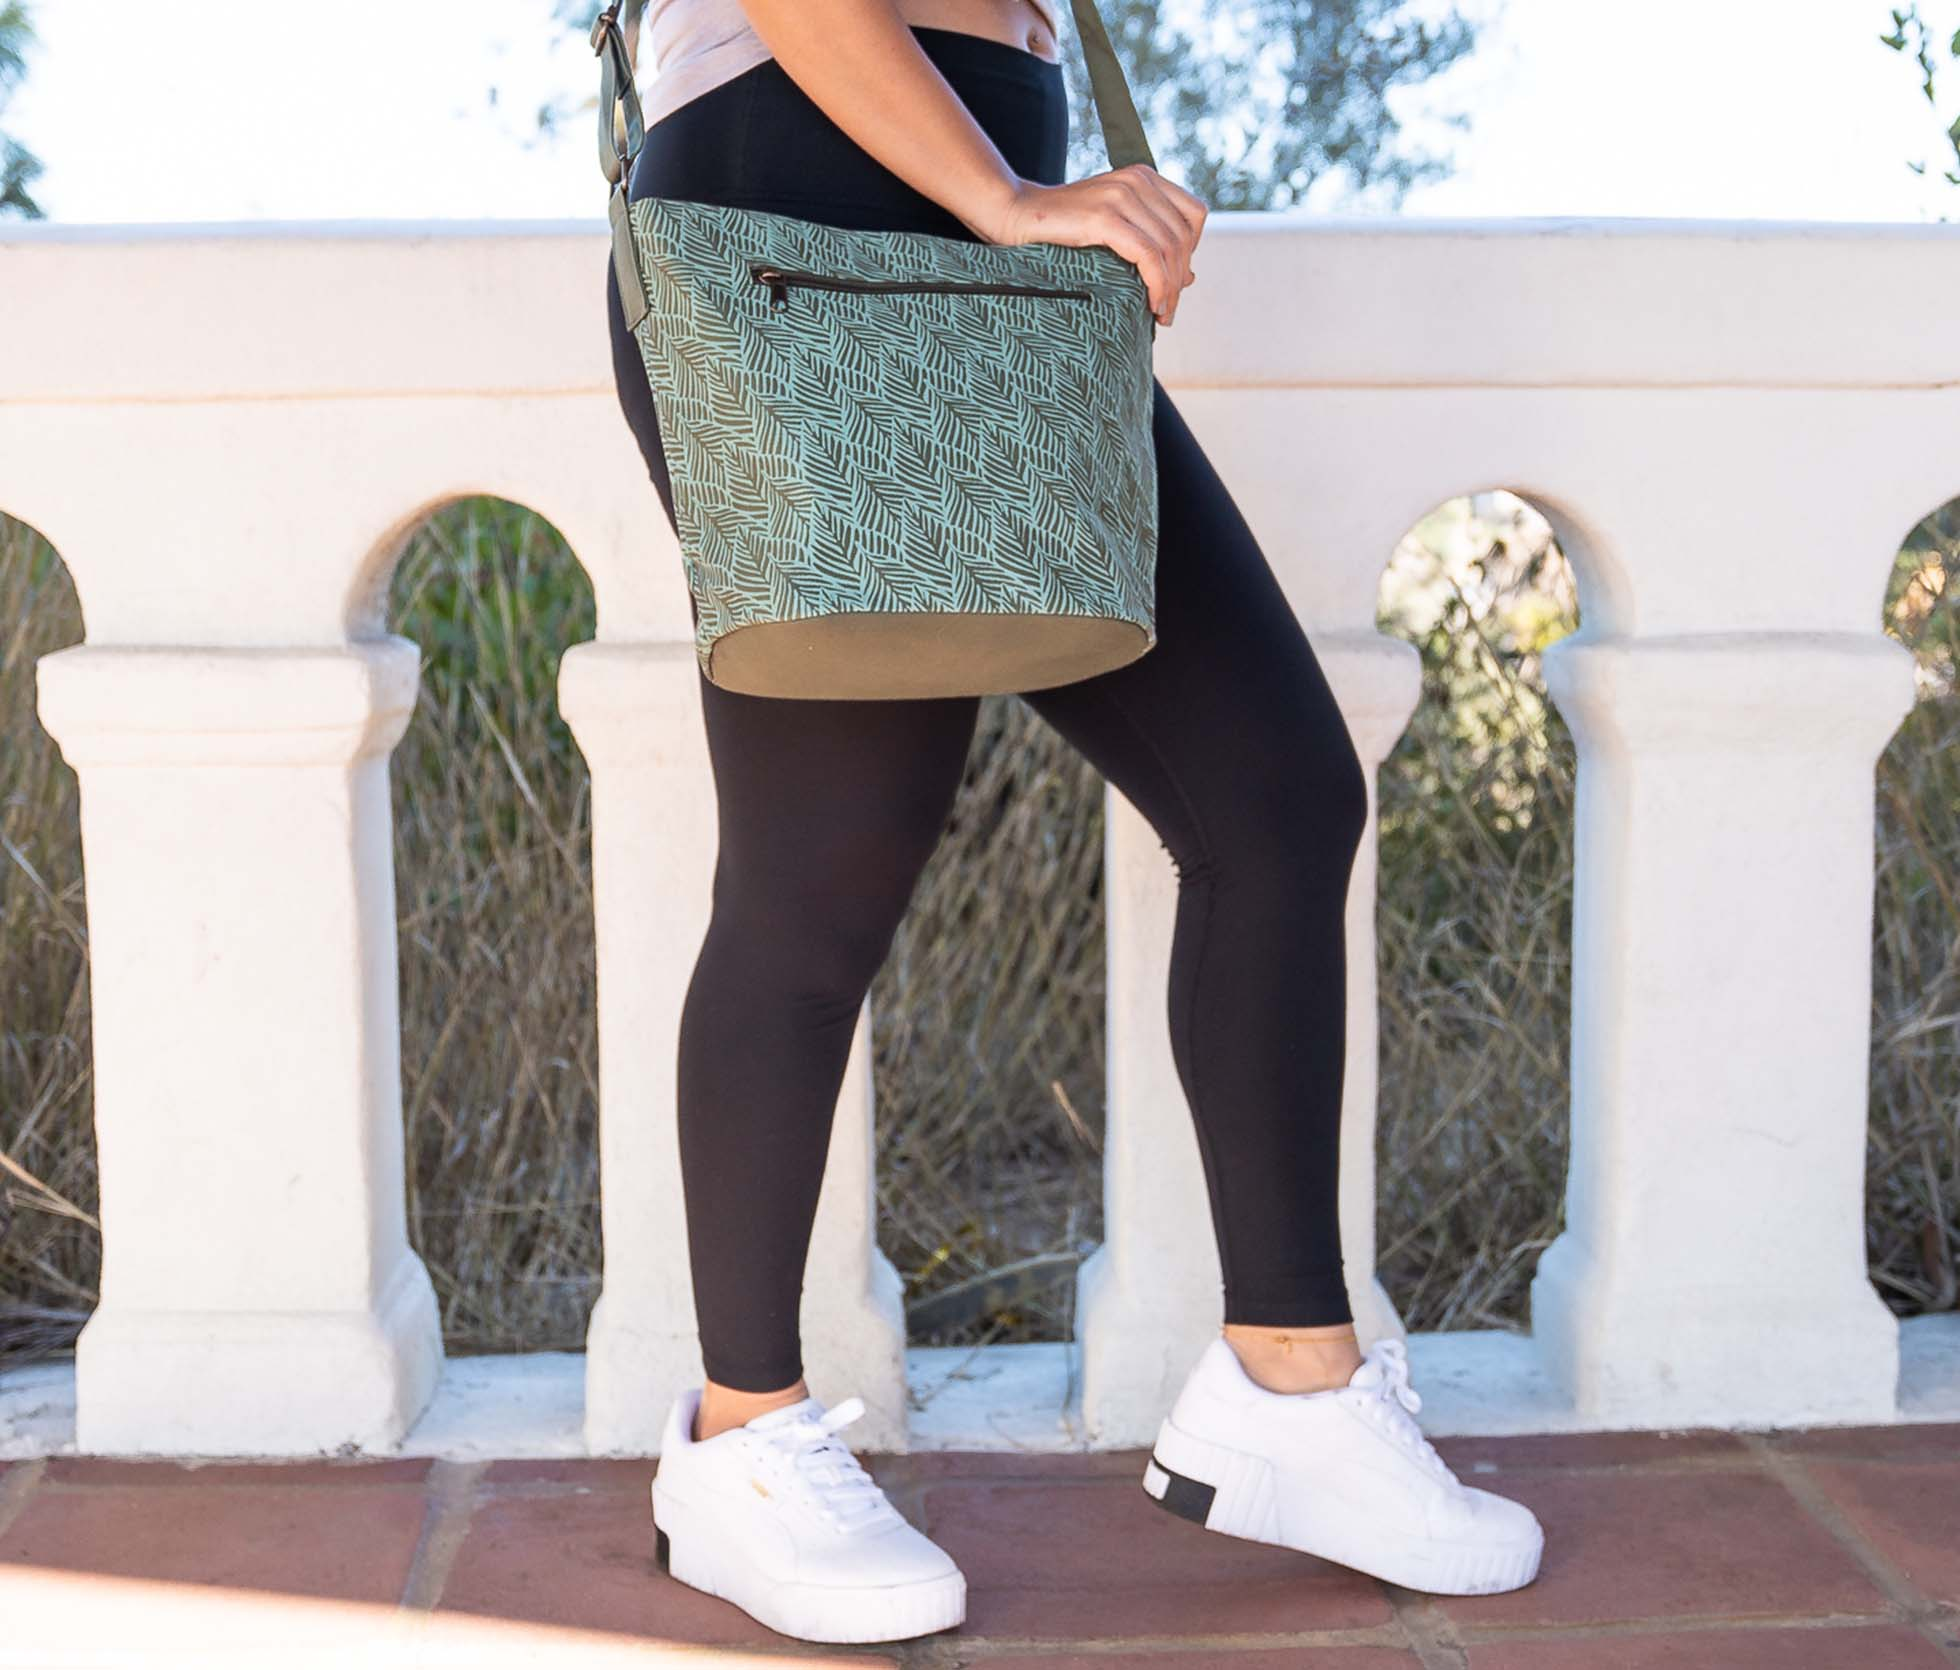 turquoise fair trade purse